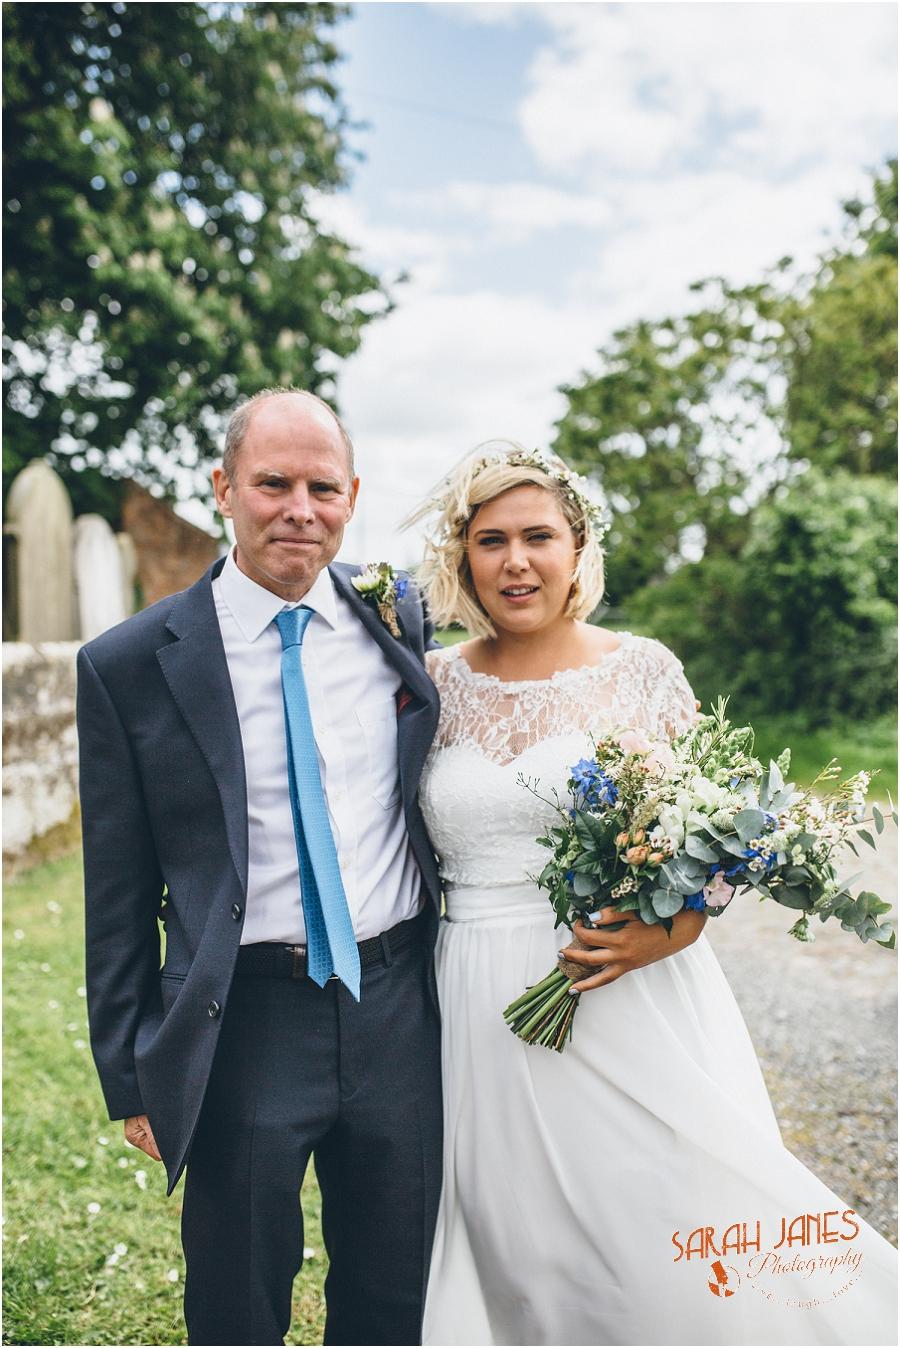 Wedding photography Kings Acre, Farm wedding, Marquee wedding photography, Sarah Janes Photography_0013.jpg